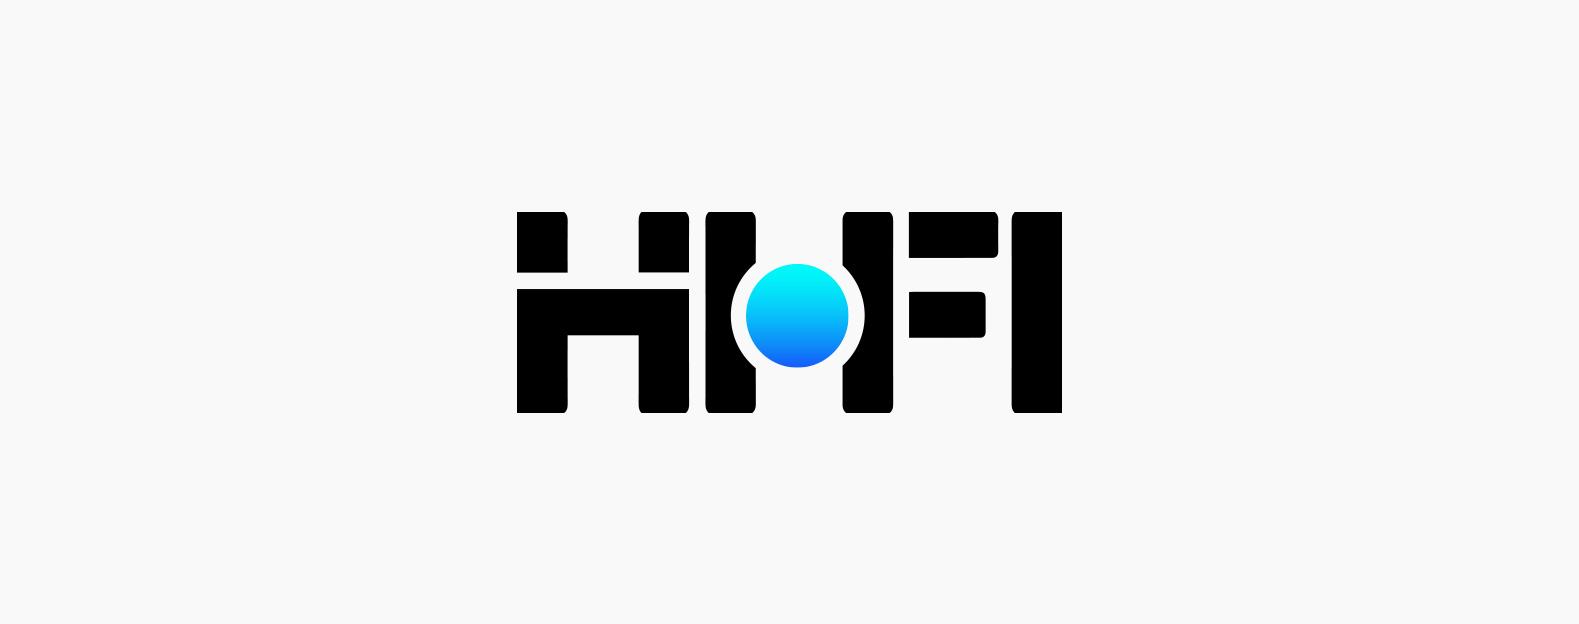 interactive_lifeinhifi_image23